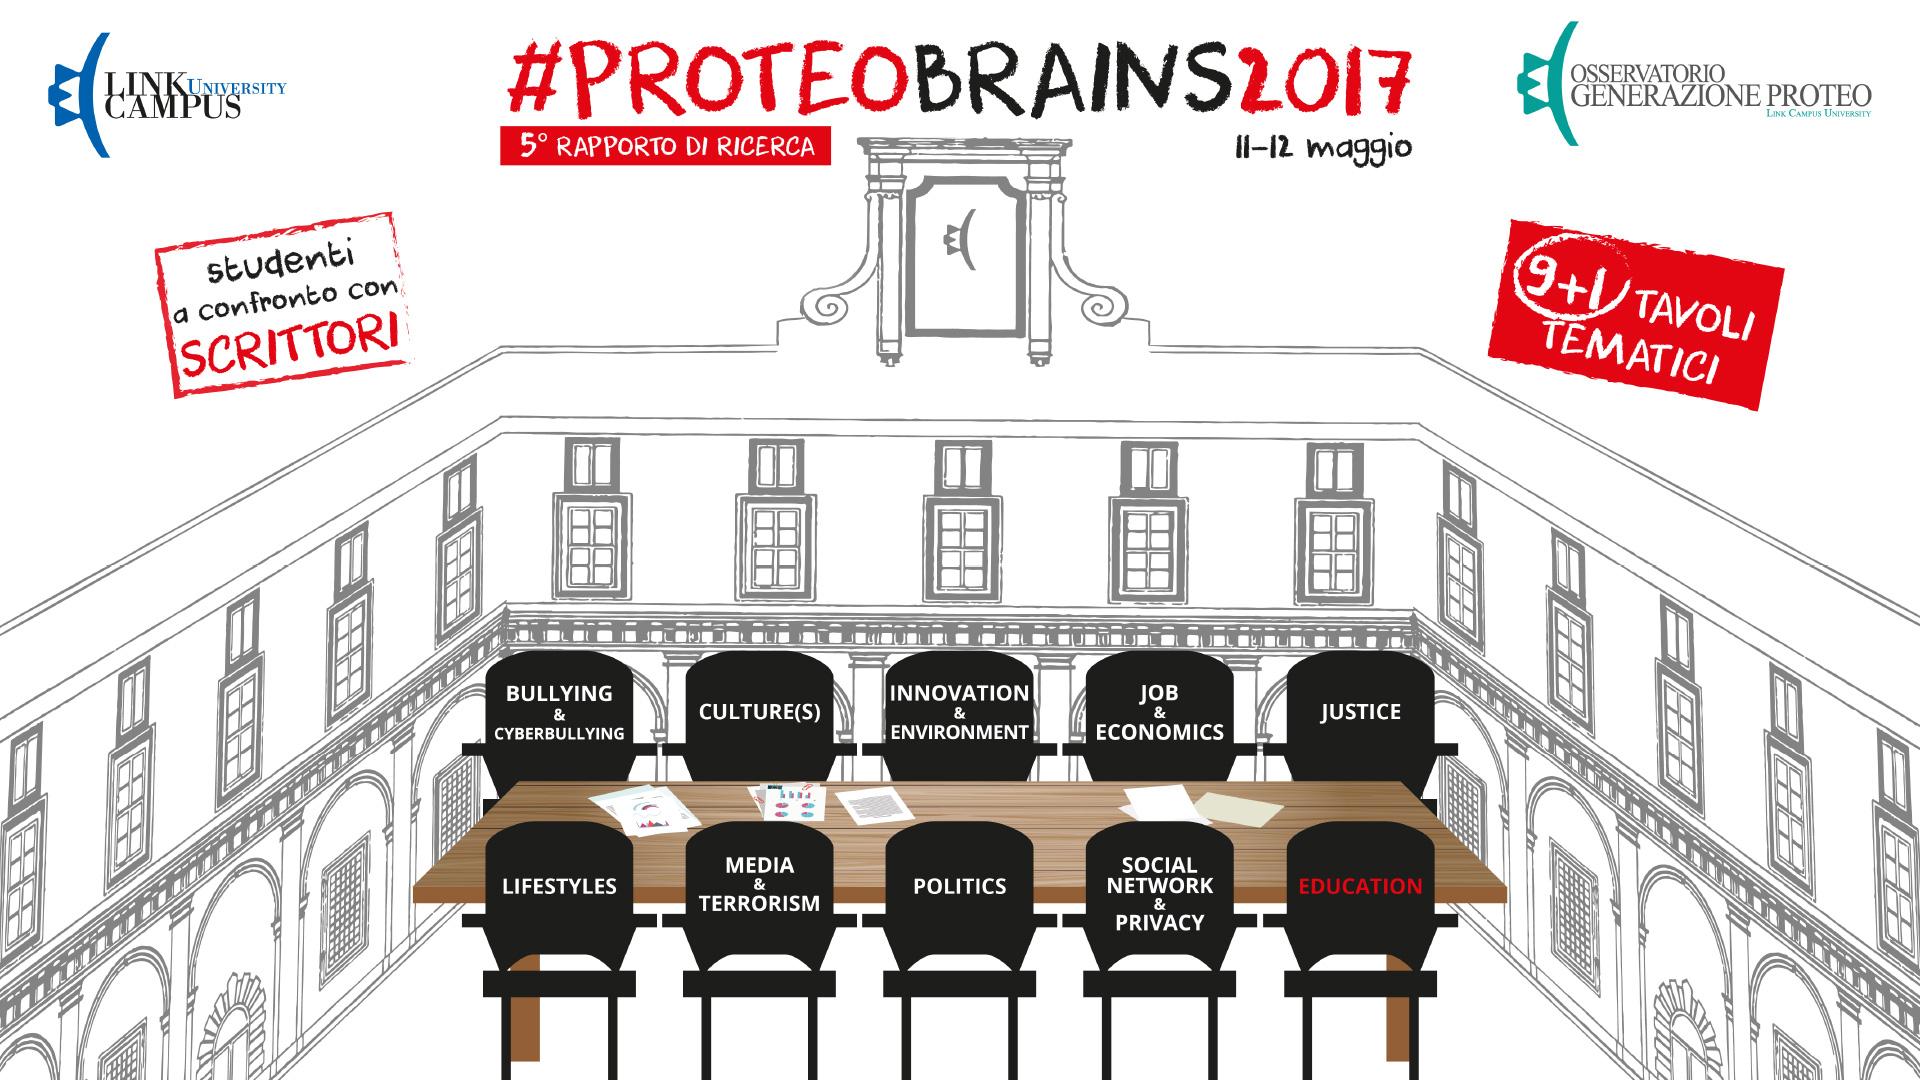 PROTEOBRAINS2017